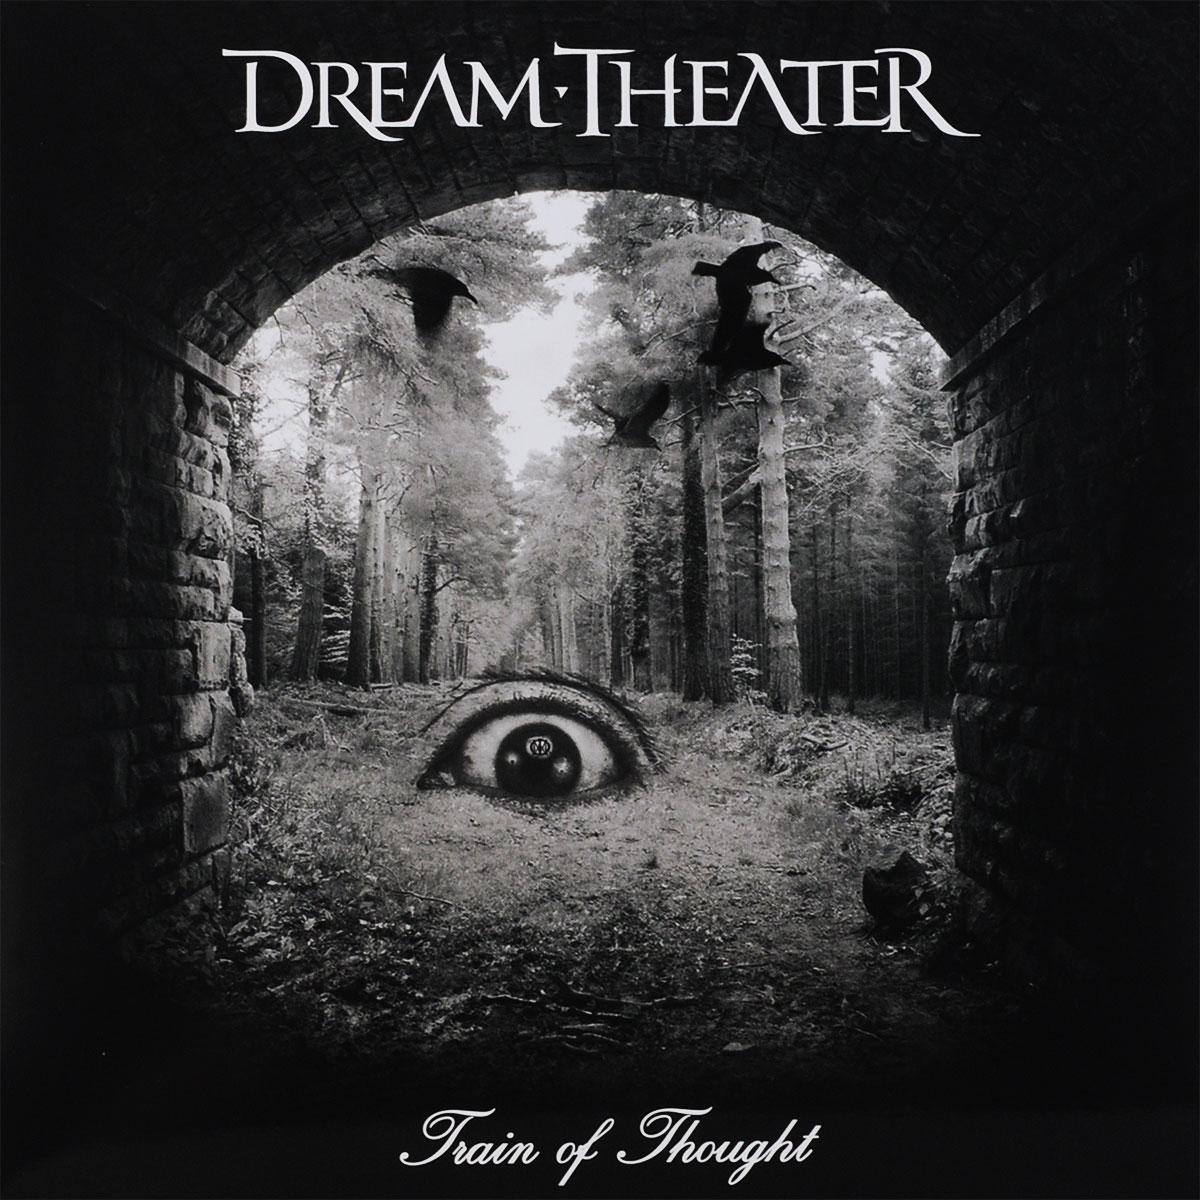 цена на Dream Theater DREAM THEATER Train Of Thought LP